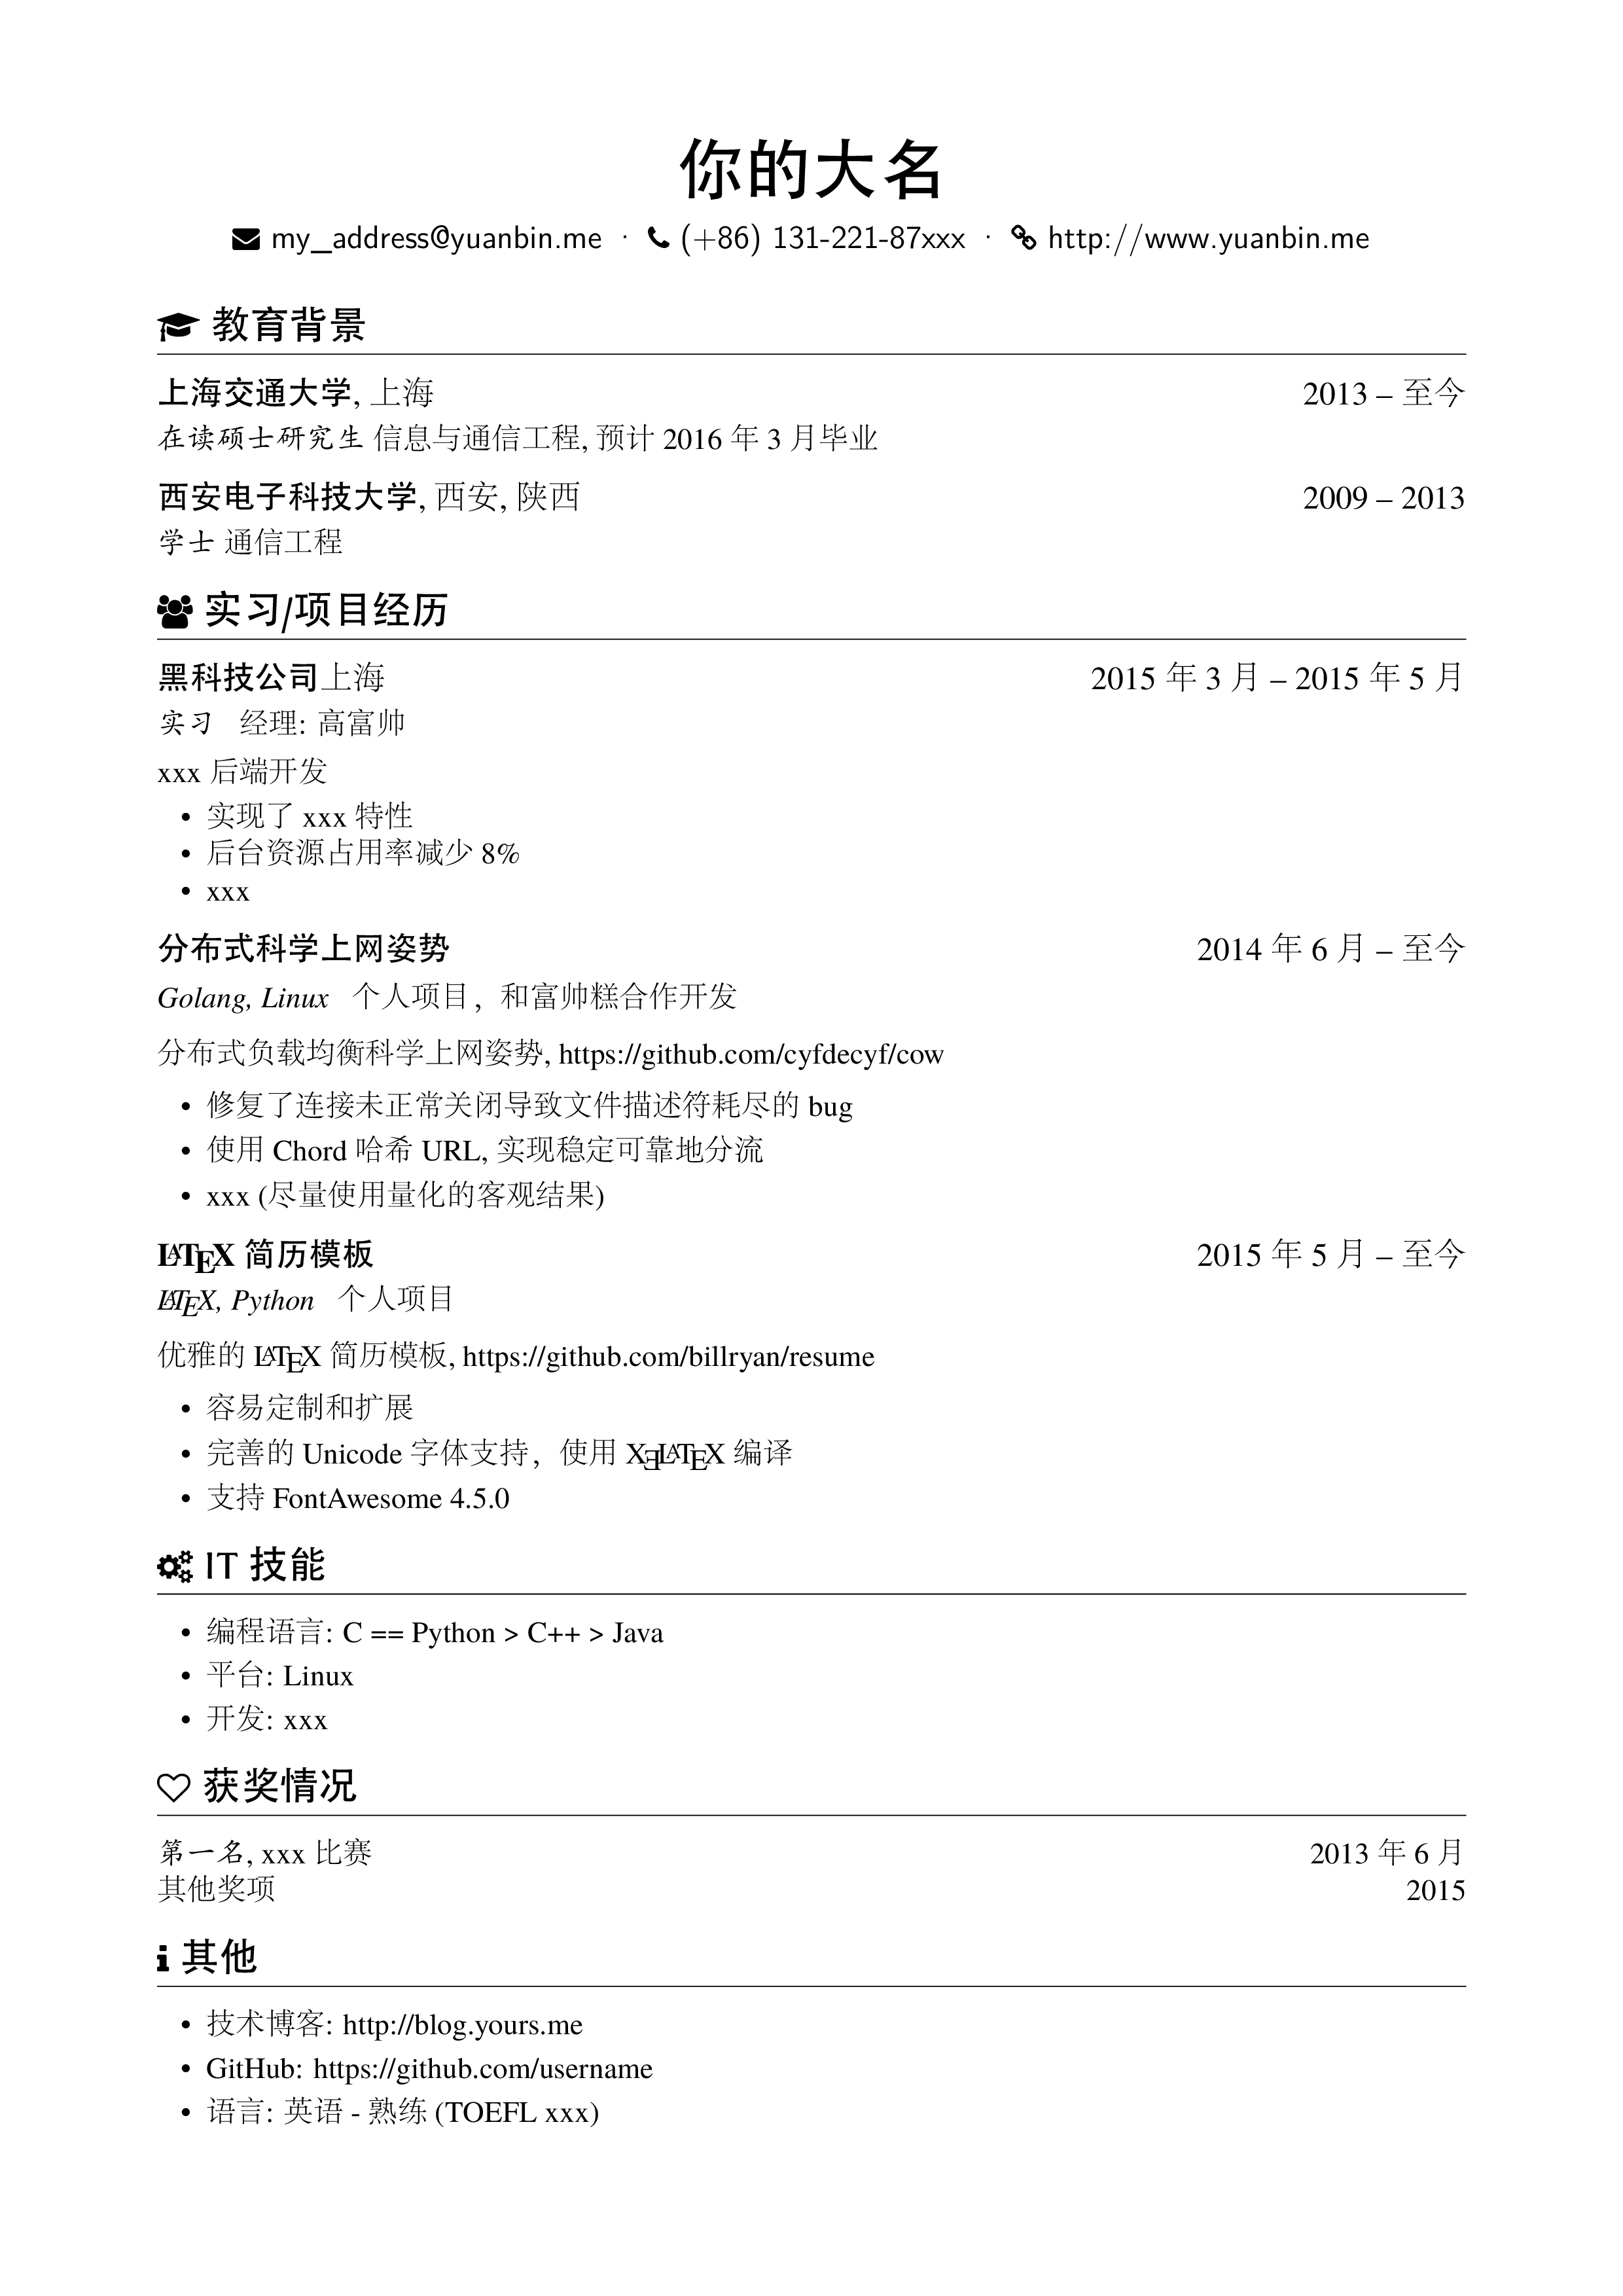 Resume Template - 简体中文